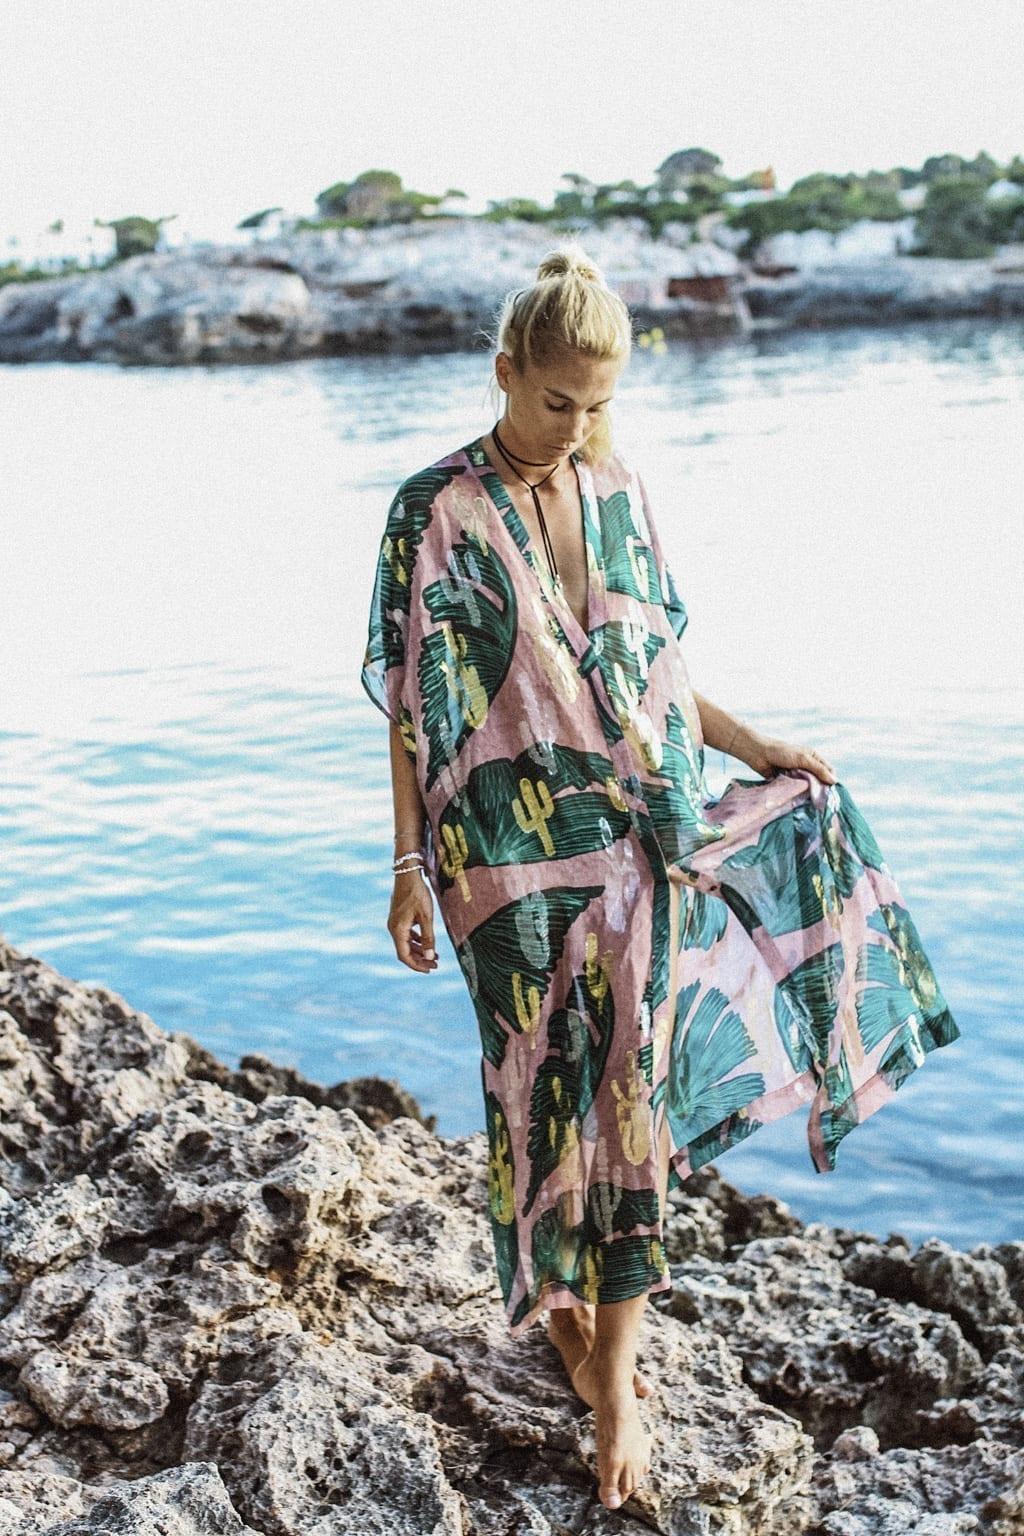 CK-1606-Mallorca-Island-Spain-Luxury-Holiday-Blogger-Beach-Outfit-Style-Fashion-Baleares-1234